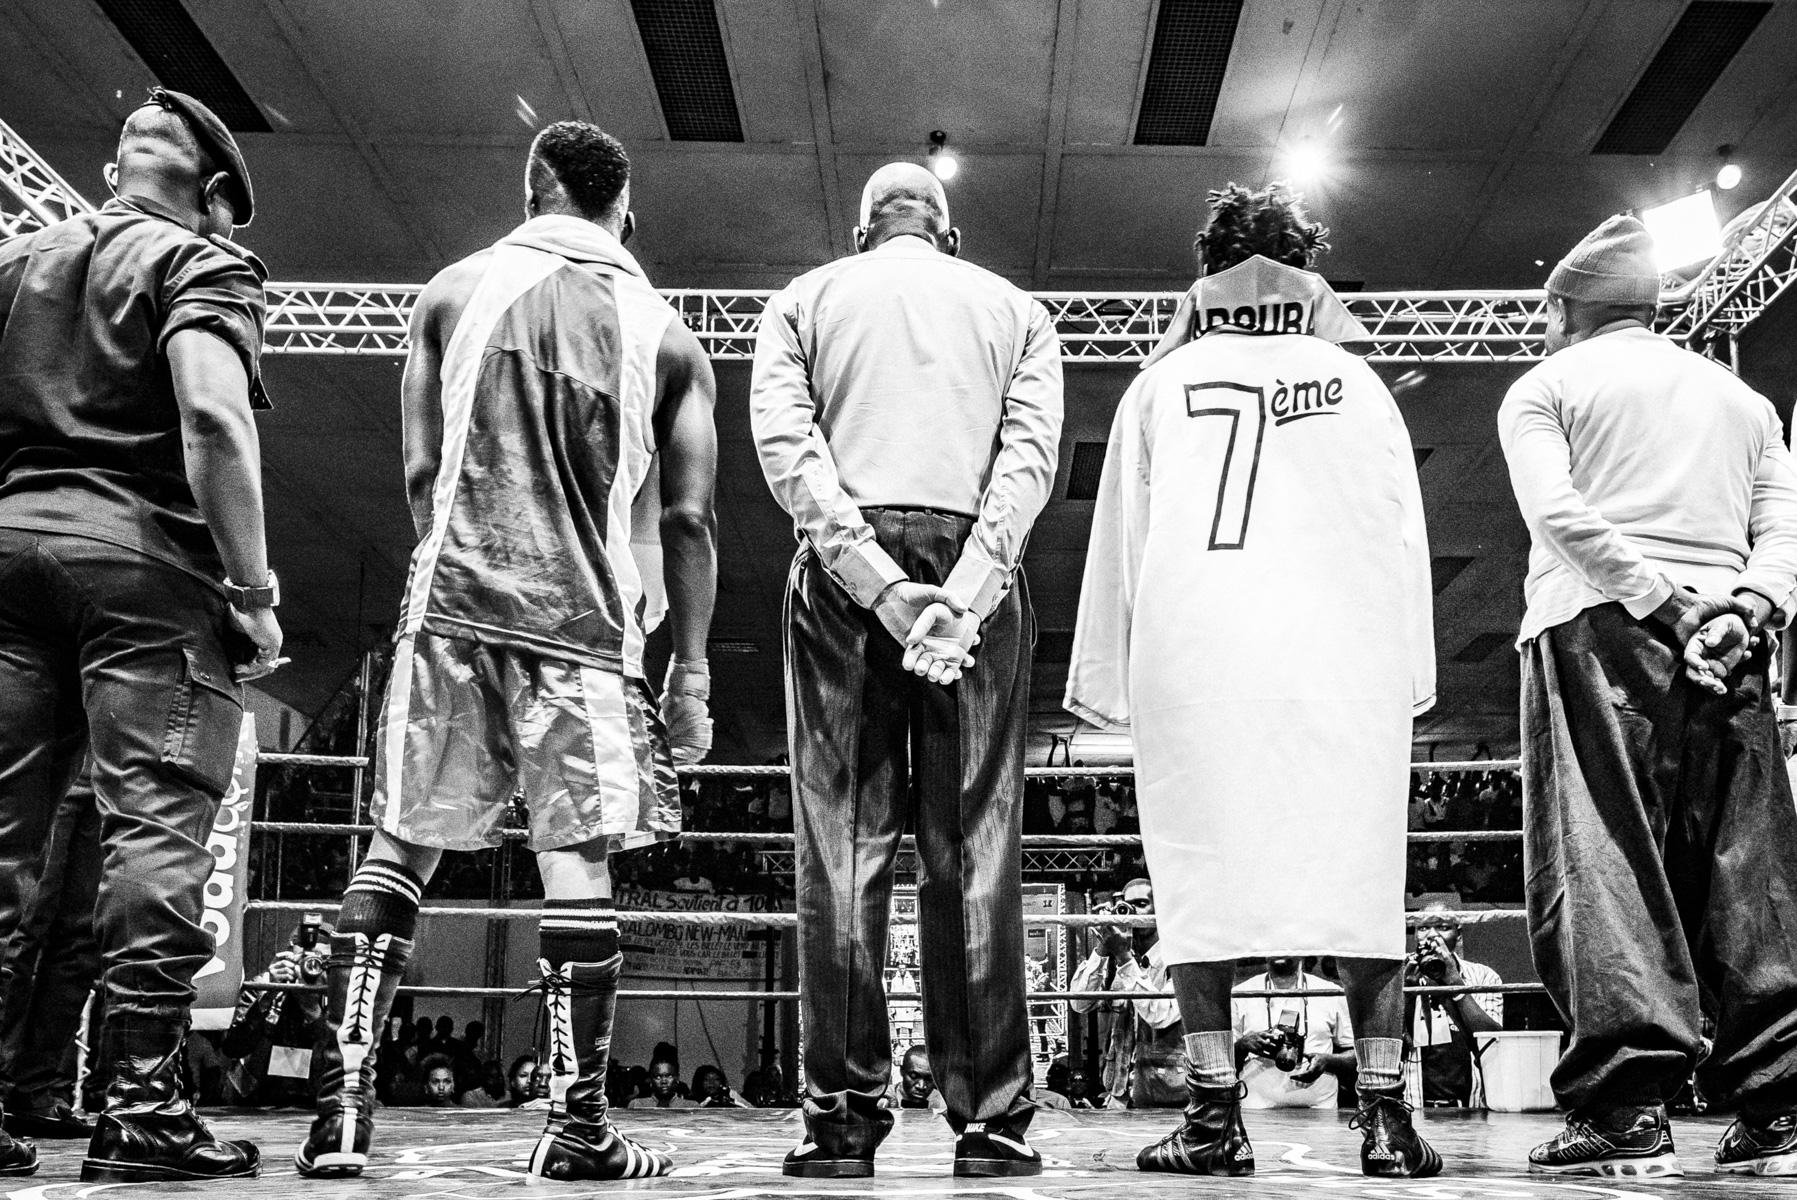 En attente du résultat du combat de boxe. Kinshasa, octobre 2014.